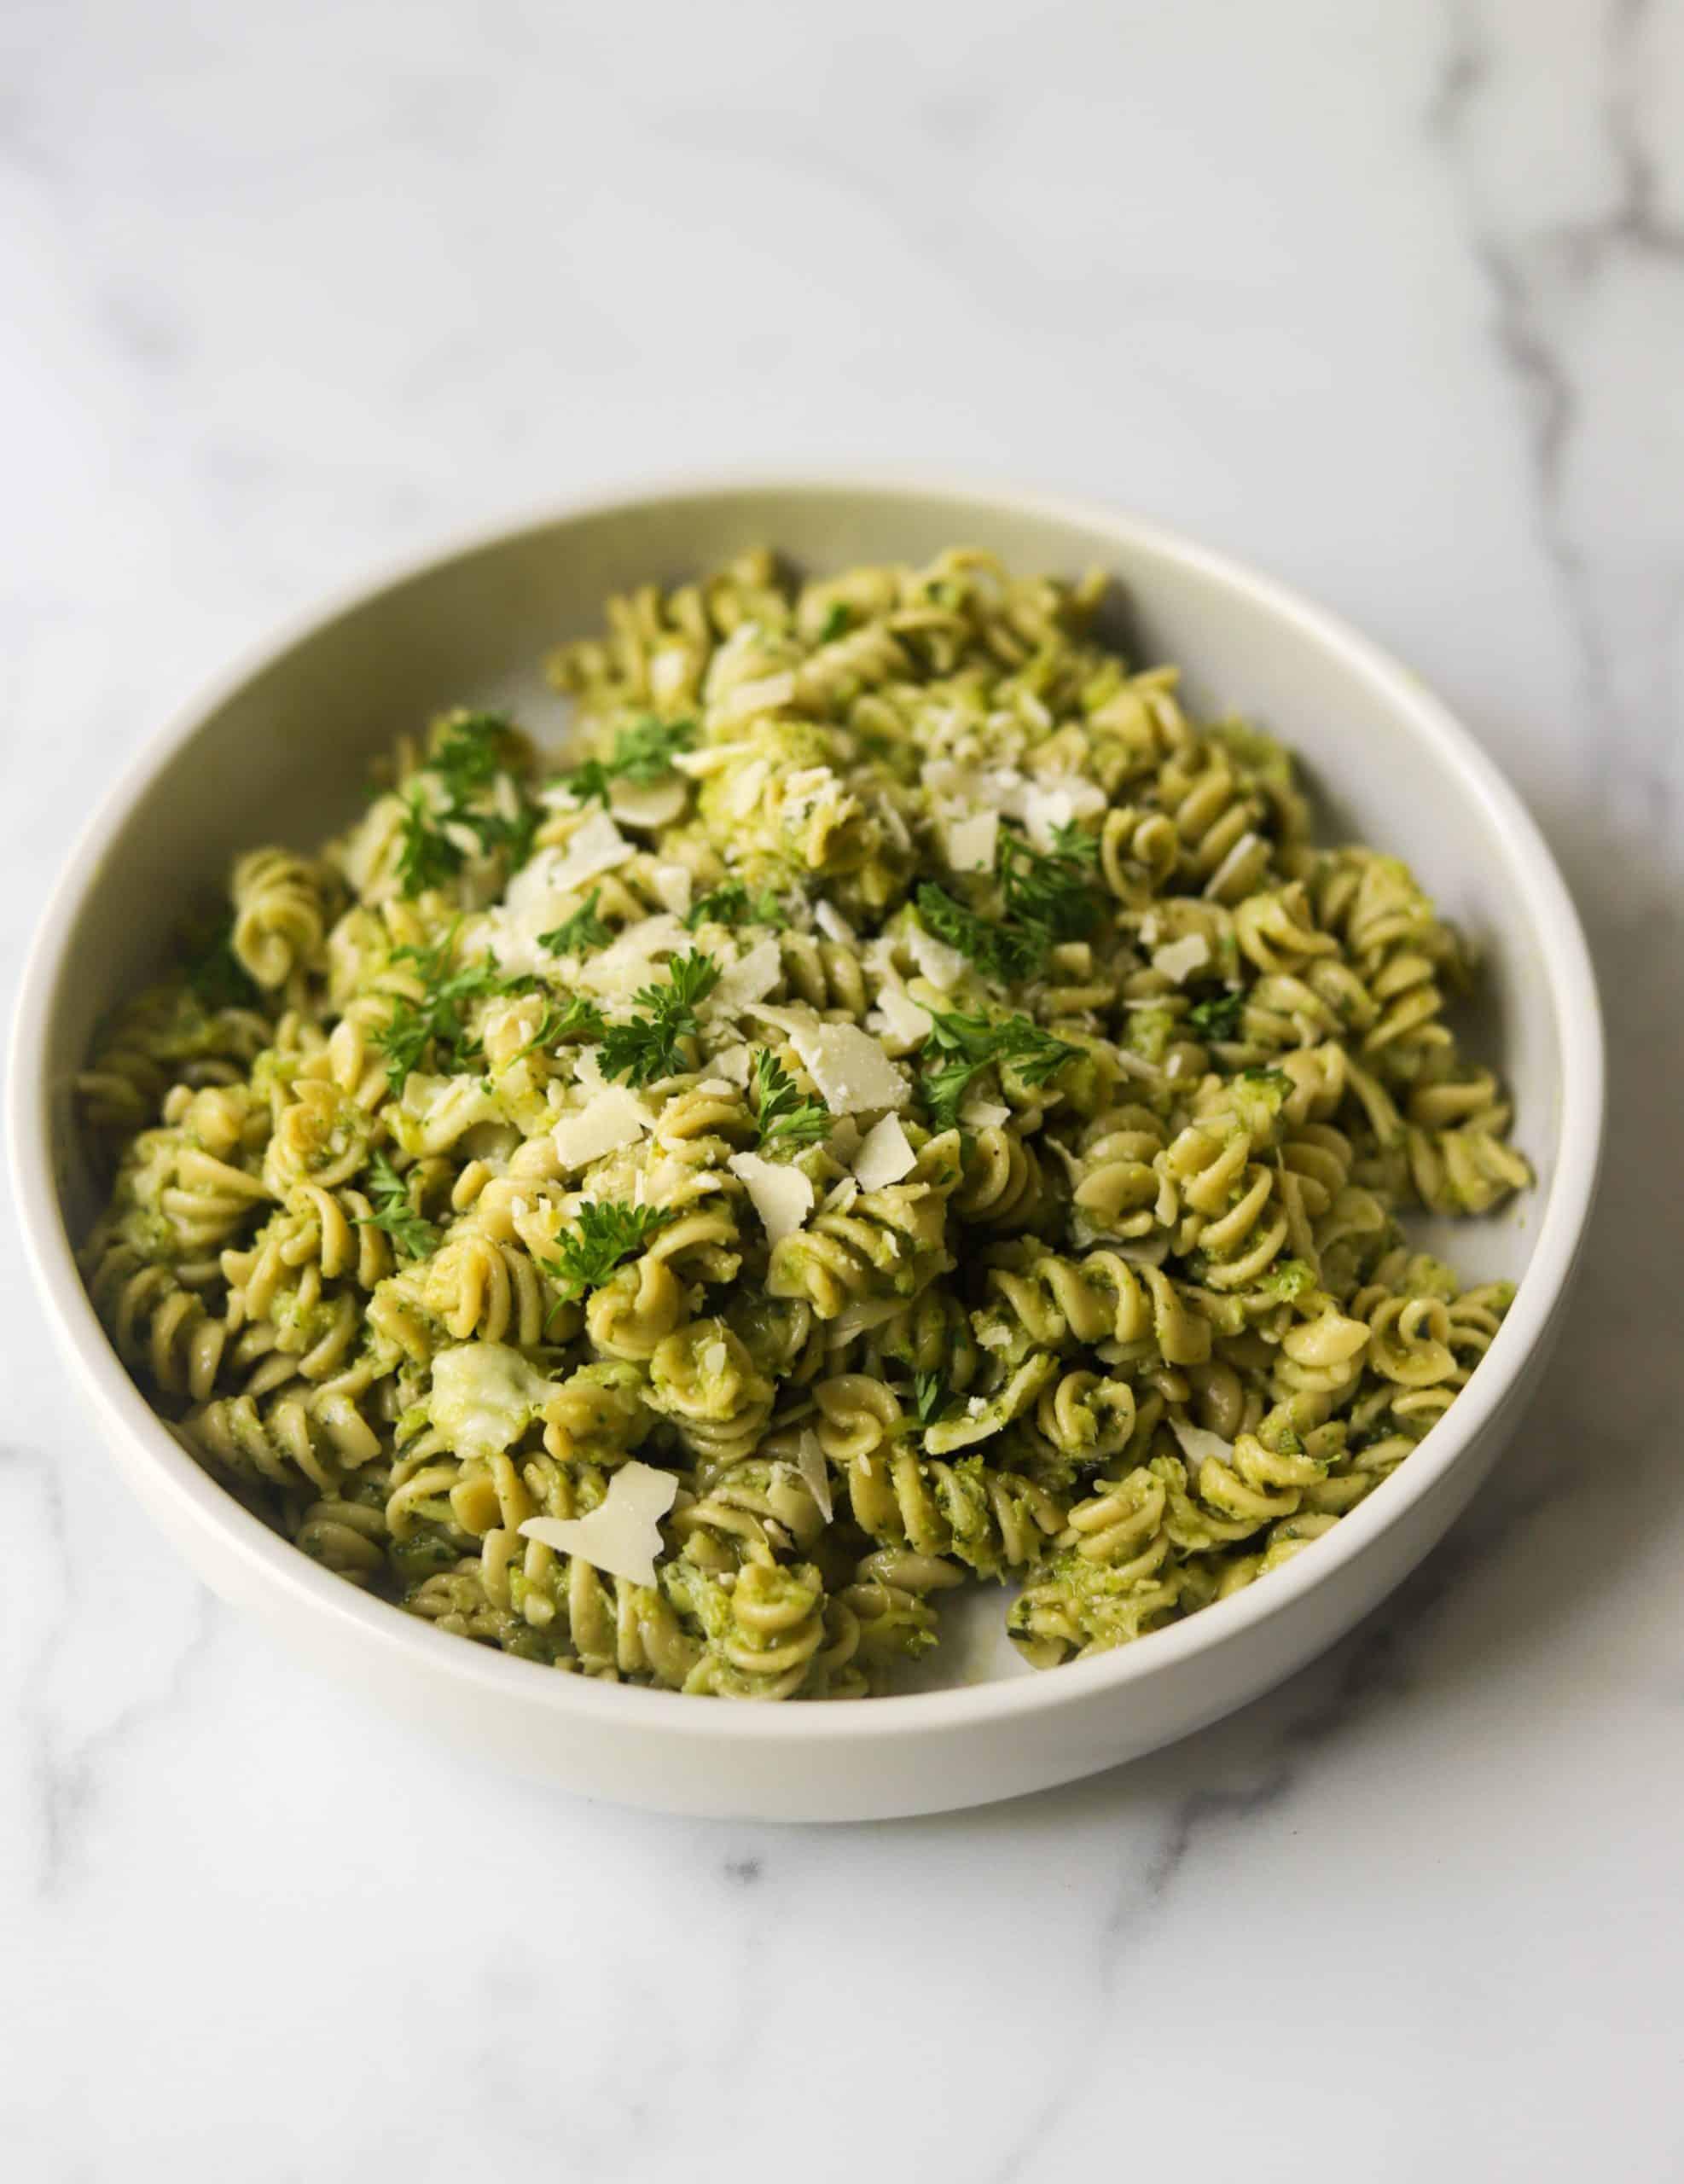 A white bowl filled with broccoli pesto pasta.